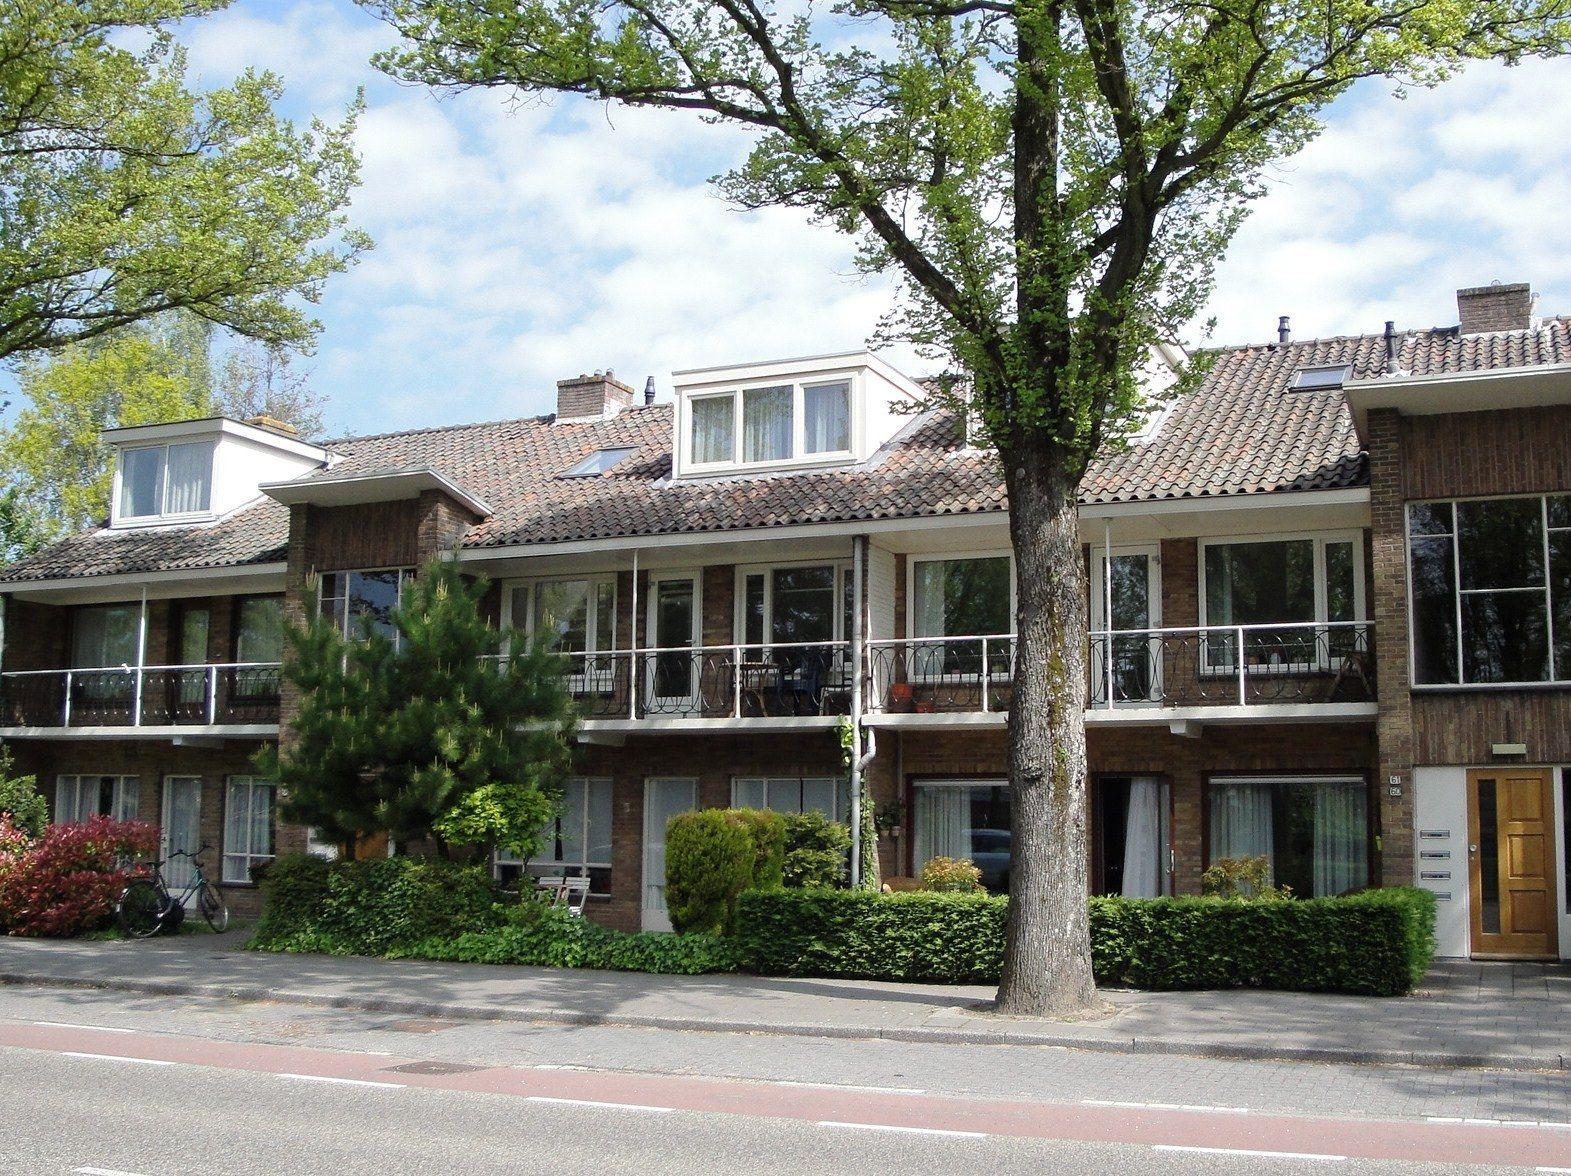 Groen van Prinstererlaan, Amstelveen